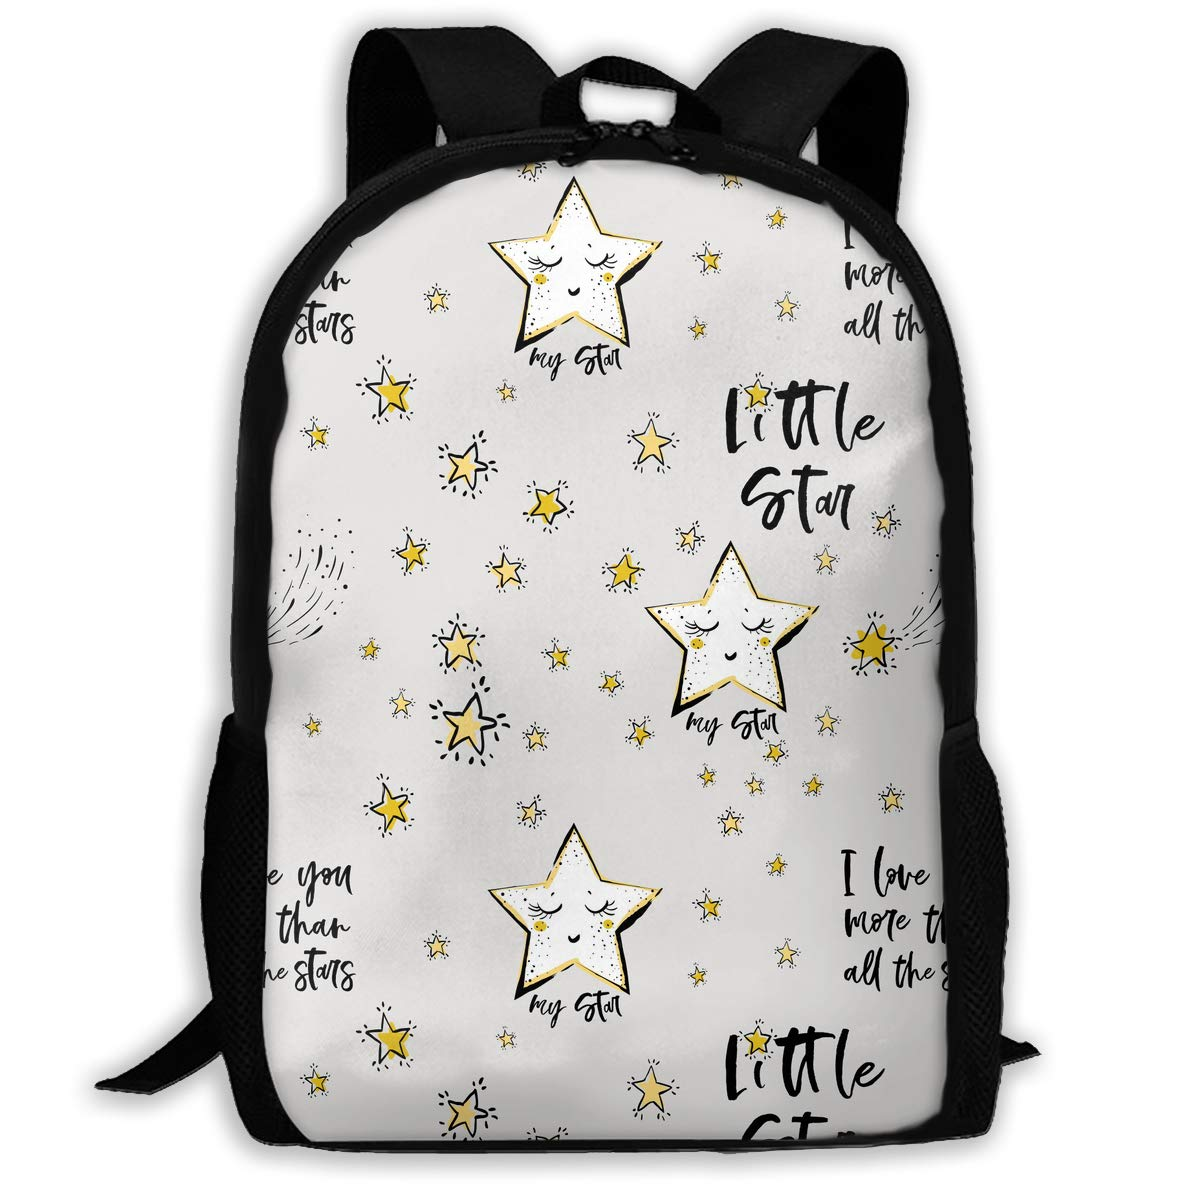 7a151300eee0 TAOHJS106 Baby Sky with Star Pattern Waterproof Adult Backpack Shoulder Bag  for Women and Men Premium Durable Rucksack Bookbag Best for Athletic